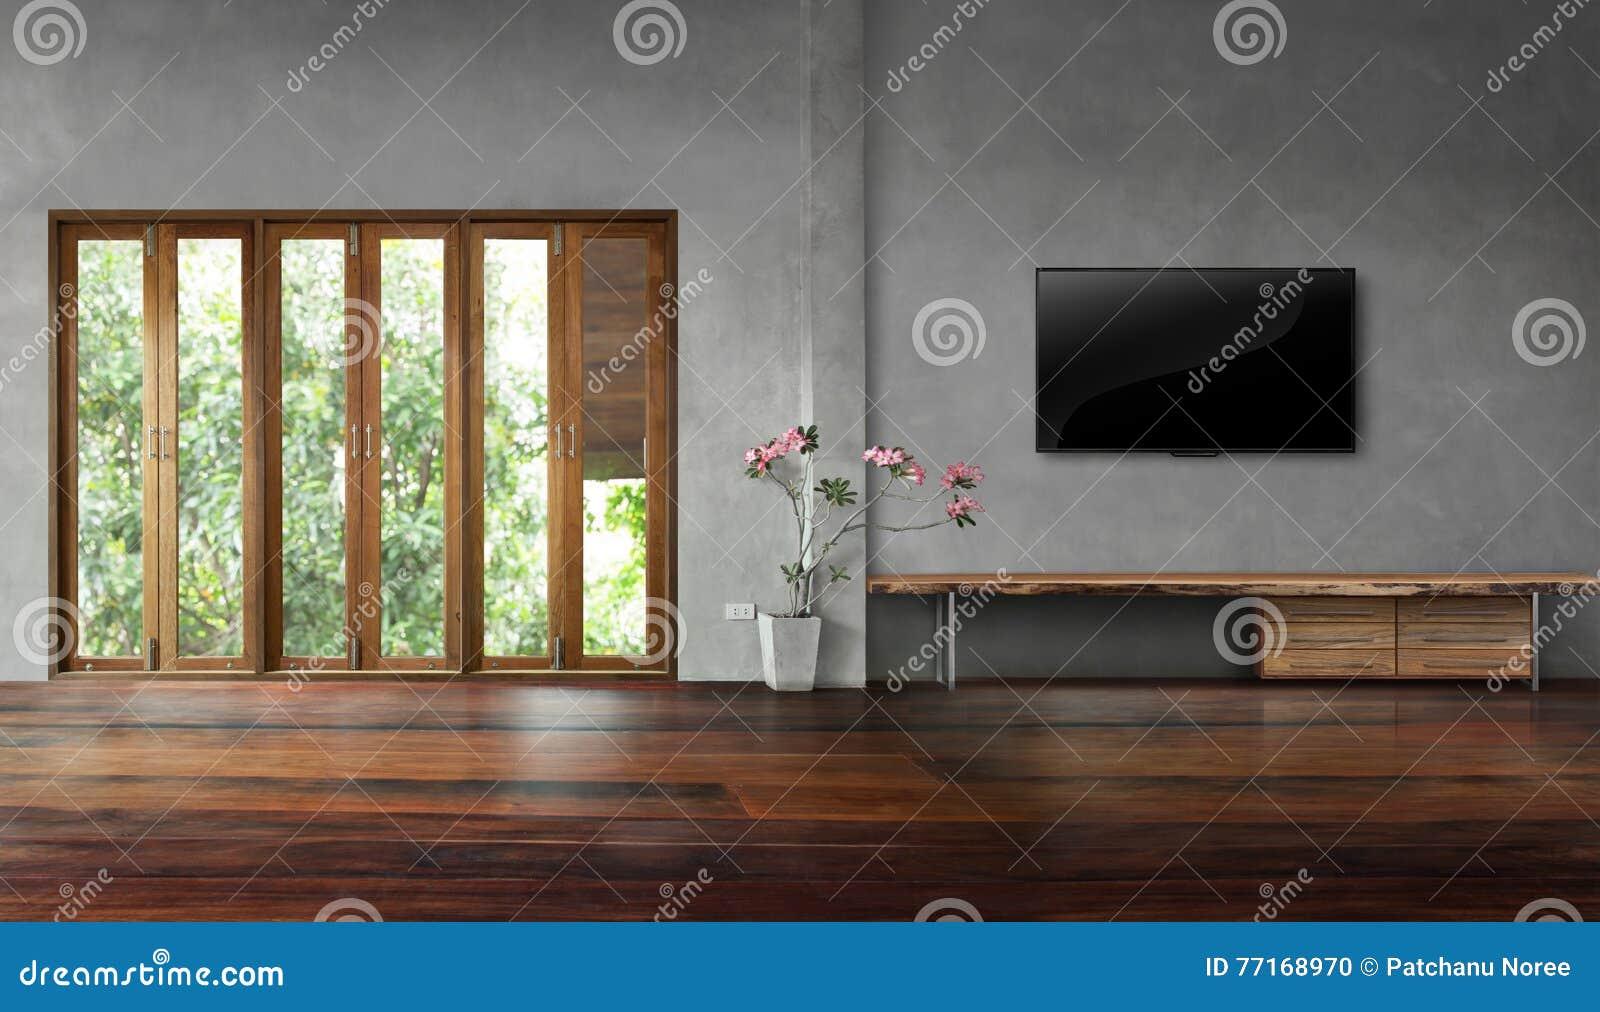 https://thumbs.dreamstime.com/z/tv-op-concrete-muur-met-lange-vensters-oude-houten-vloeren-lege-woonkamer-77168970.jpg